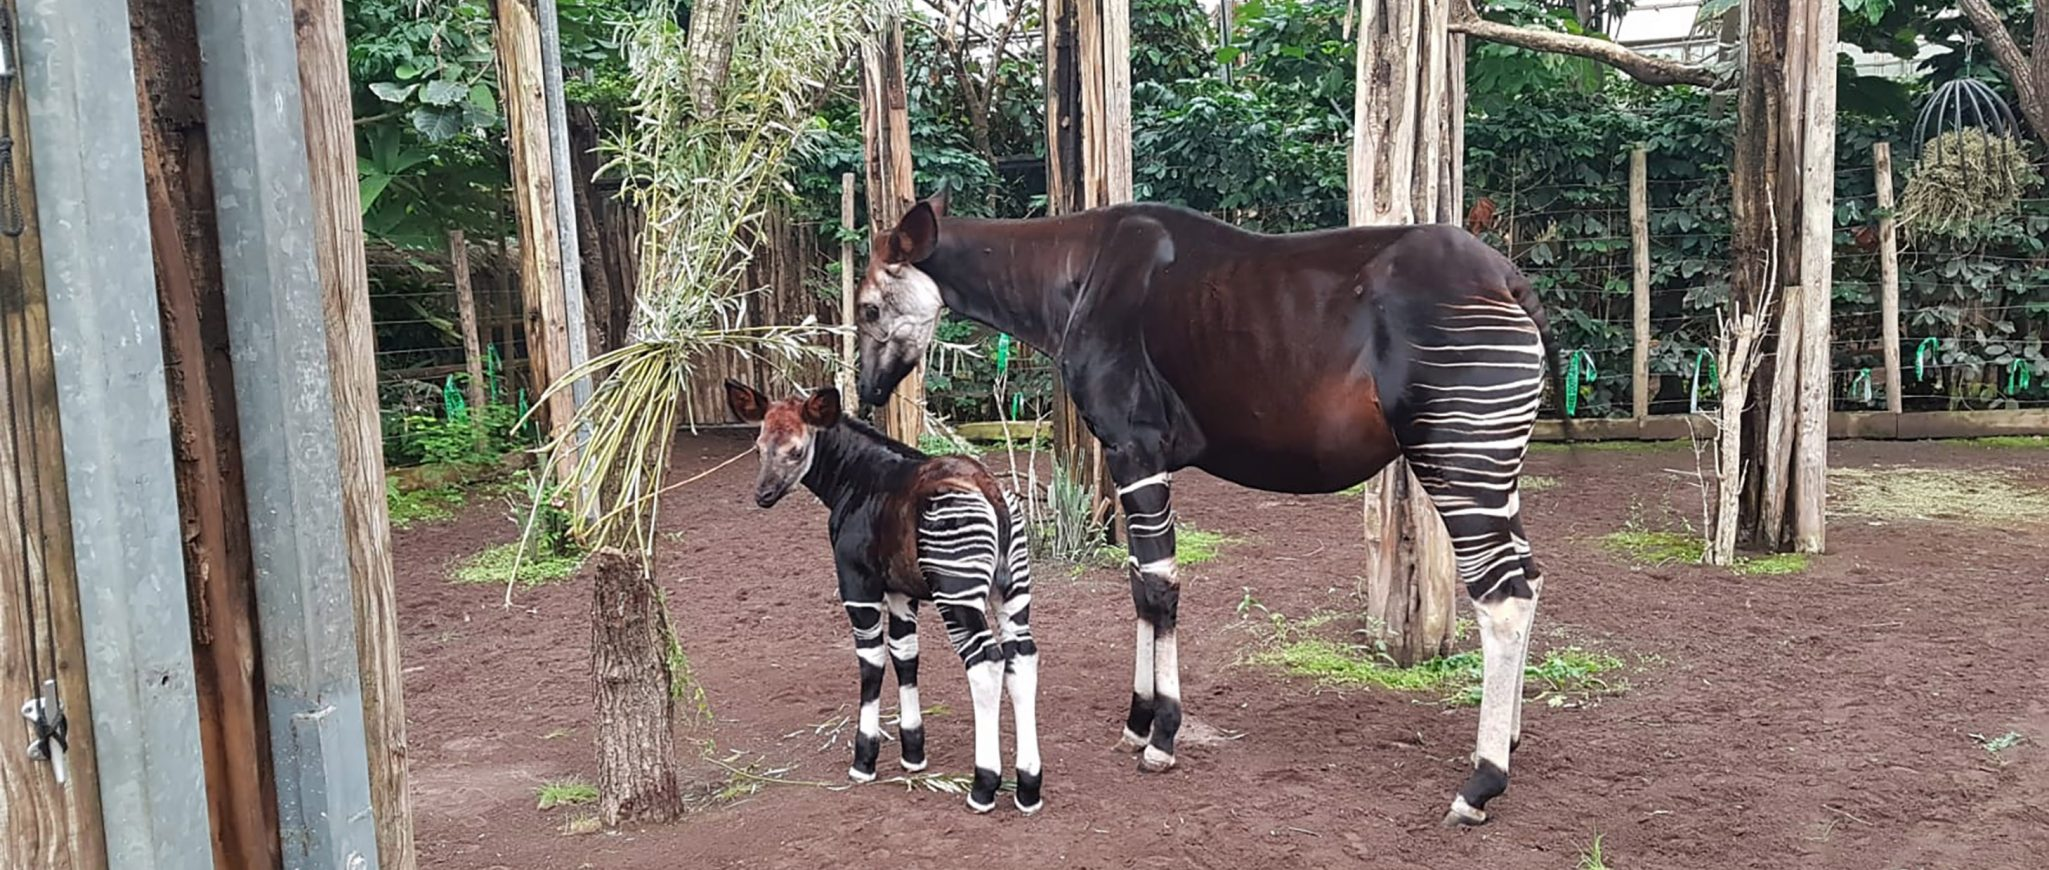 newborn okapi Kisala discovers enclosure